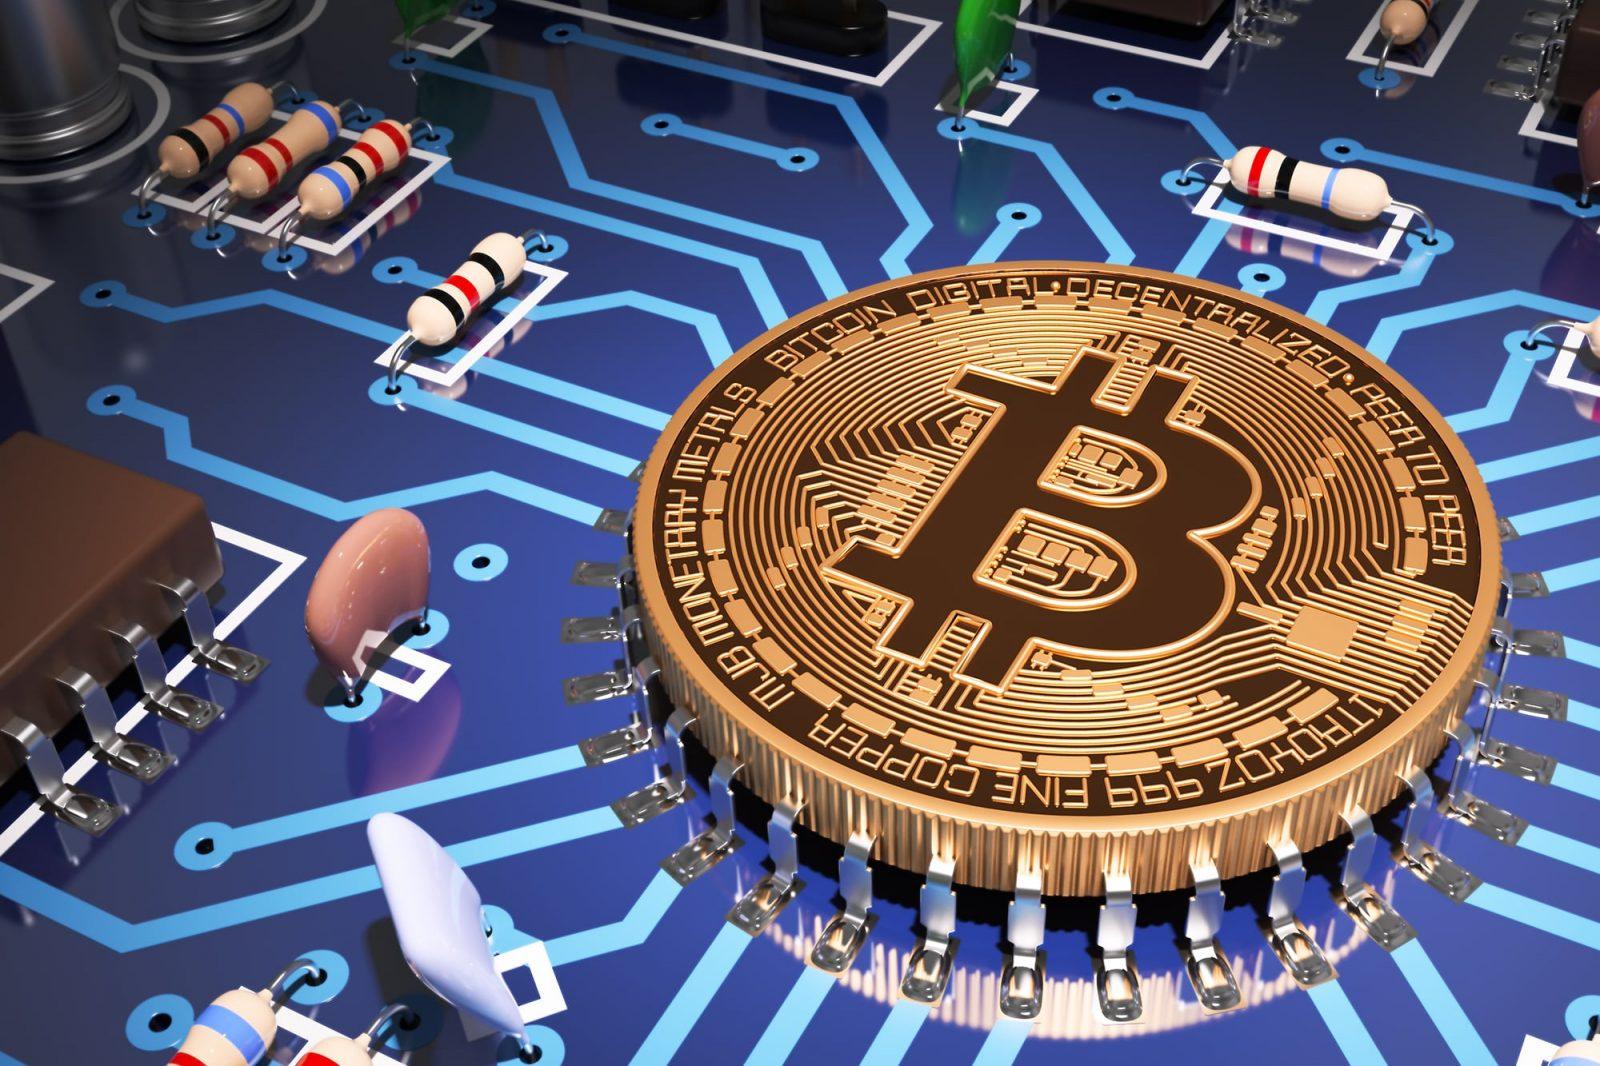 bitcoin 1 - When Will Bitcoin Price Top? Do Not Be a Pig